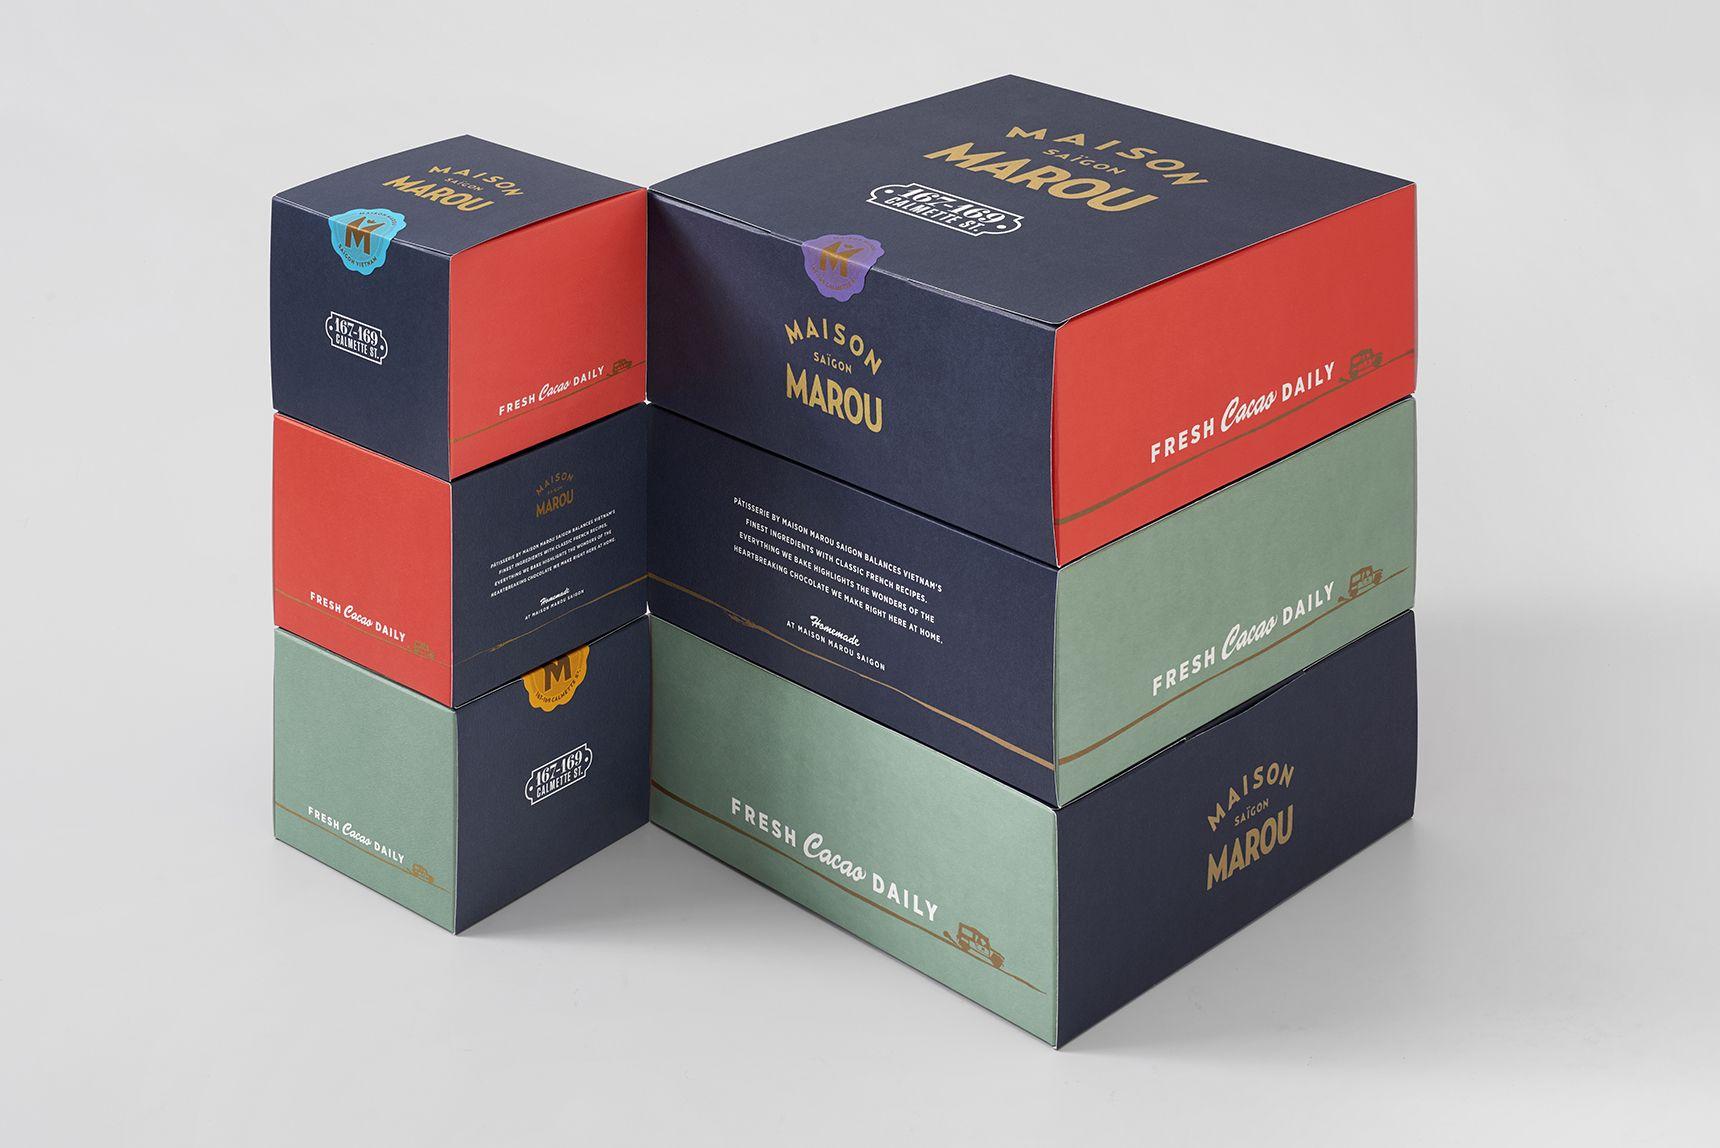 Maison Marou Has Some Elegant Chocolate Packaging Modern Packaging Design Modern Packaging Chocolate Packaging